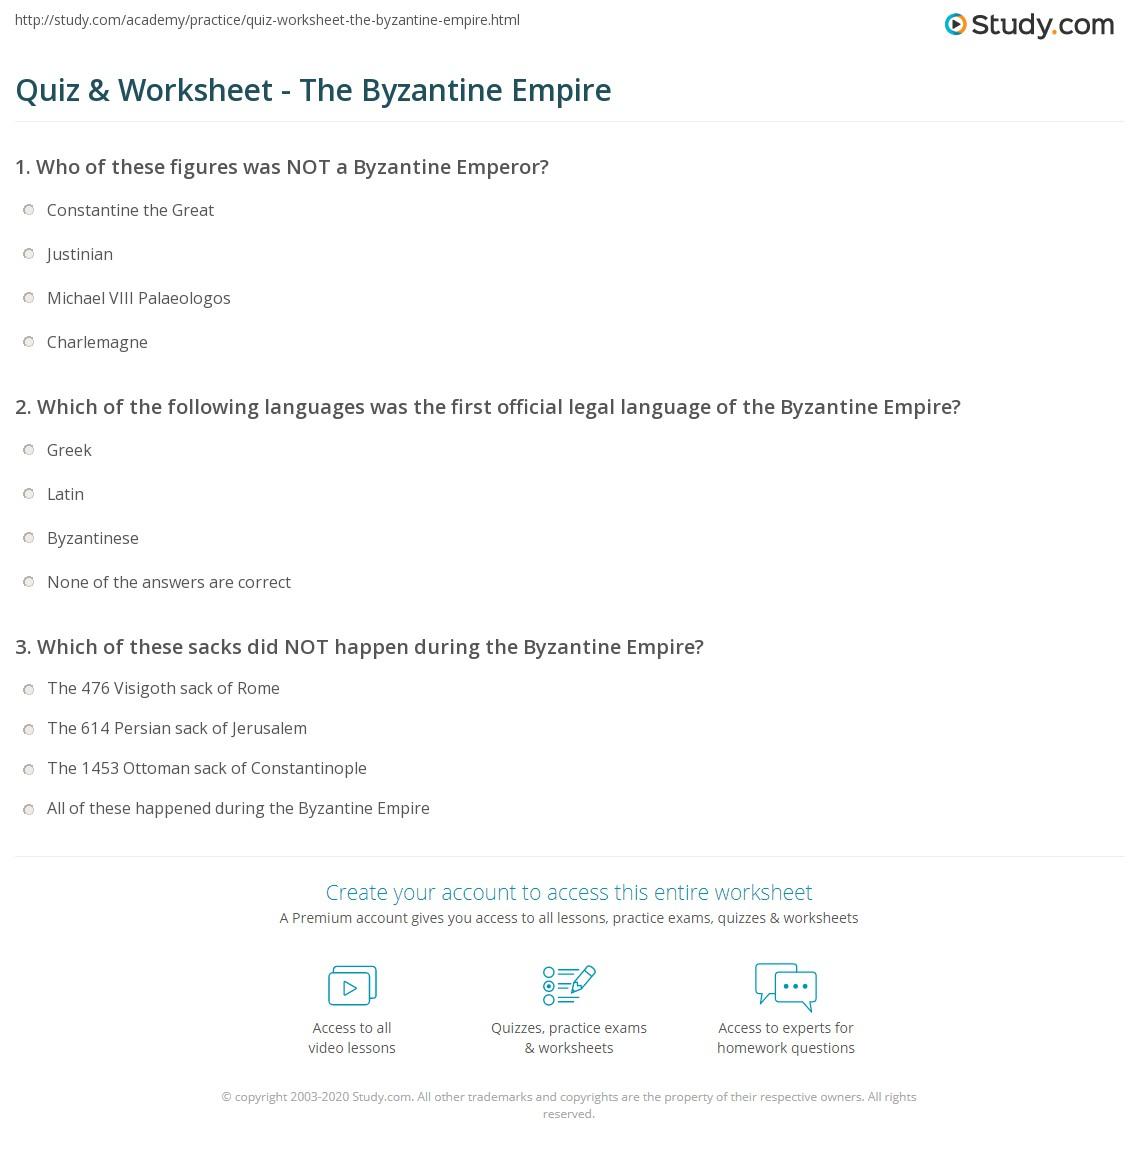 Quiz & Worksheet - The Byzantine Empire | Study.com